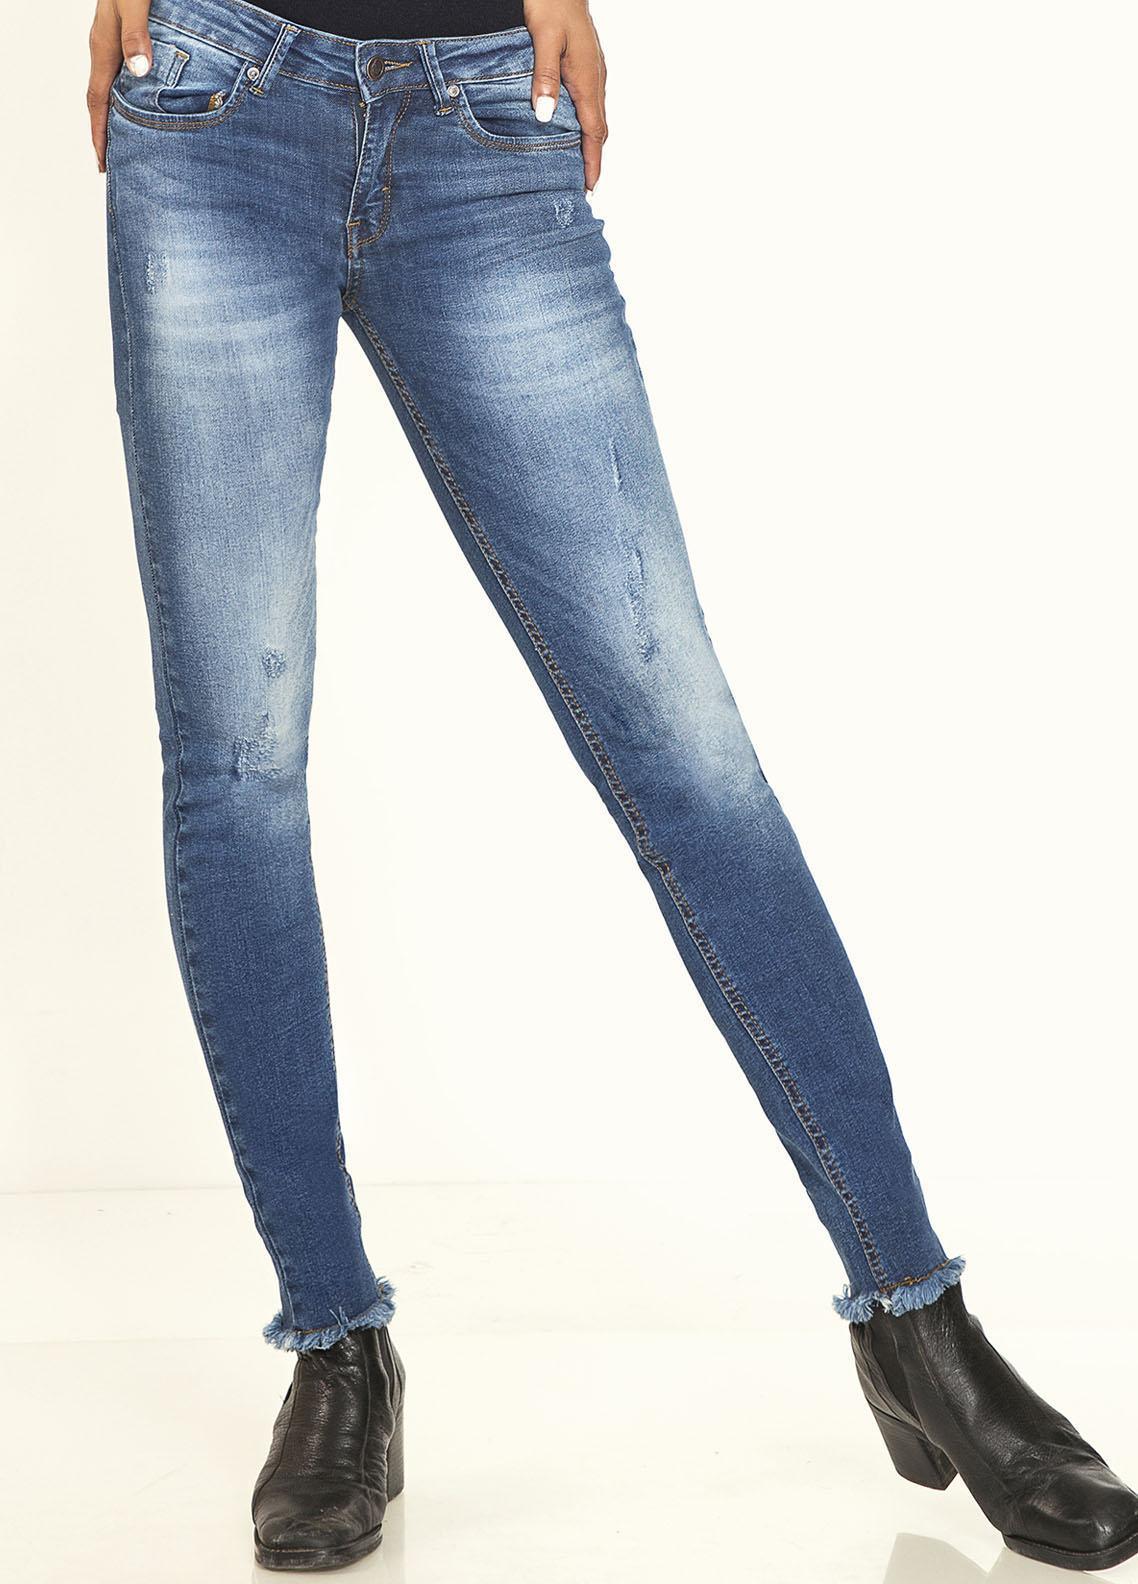 Kross Kulture Perfect Curves Denim Jeans KWA-20-011 MBU